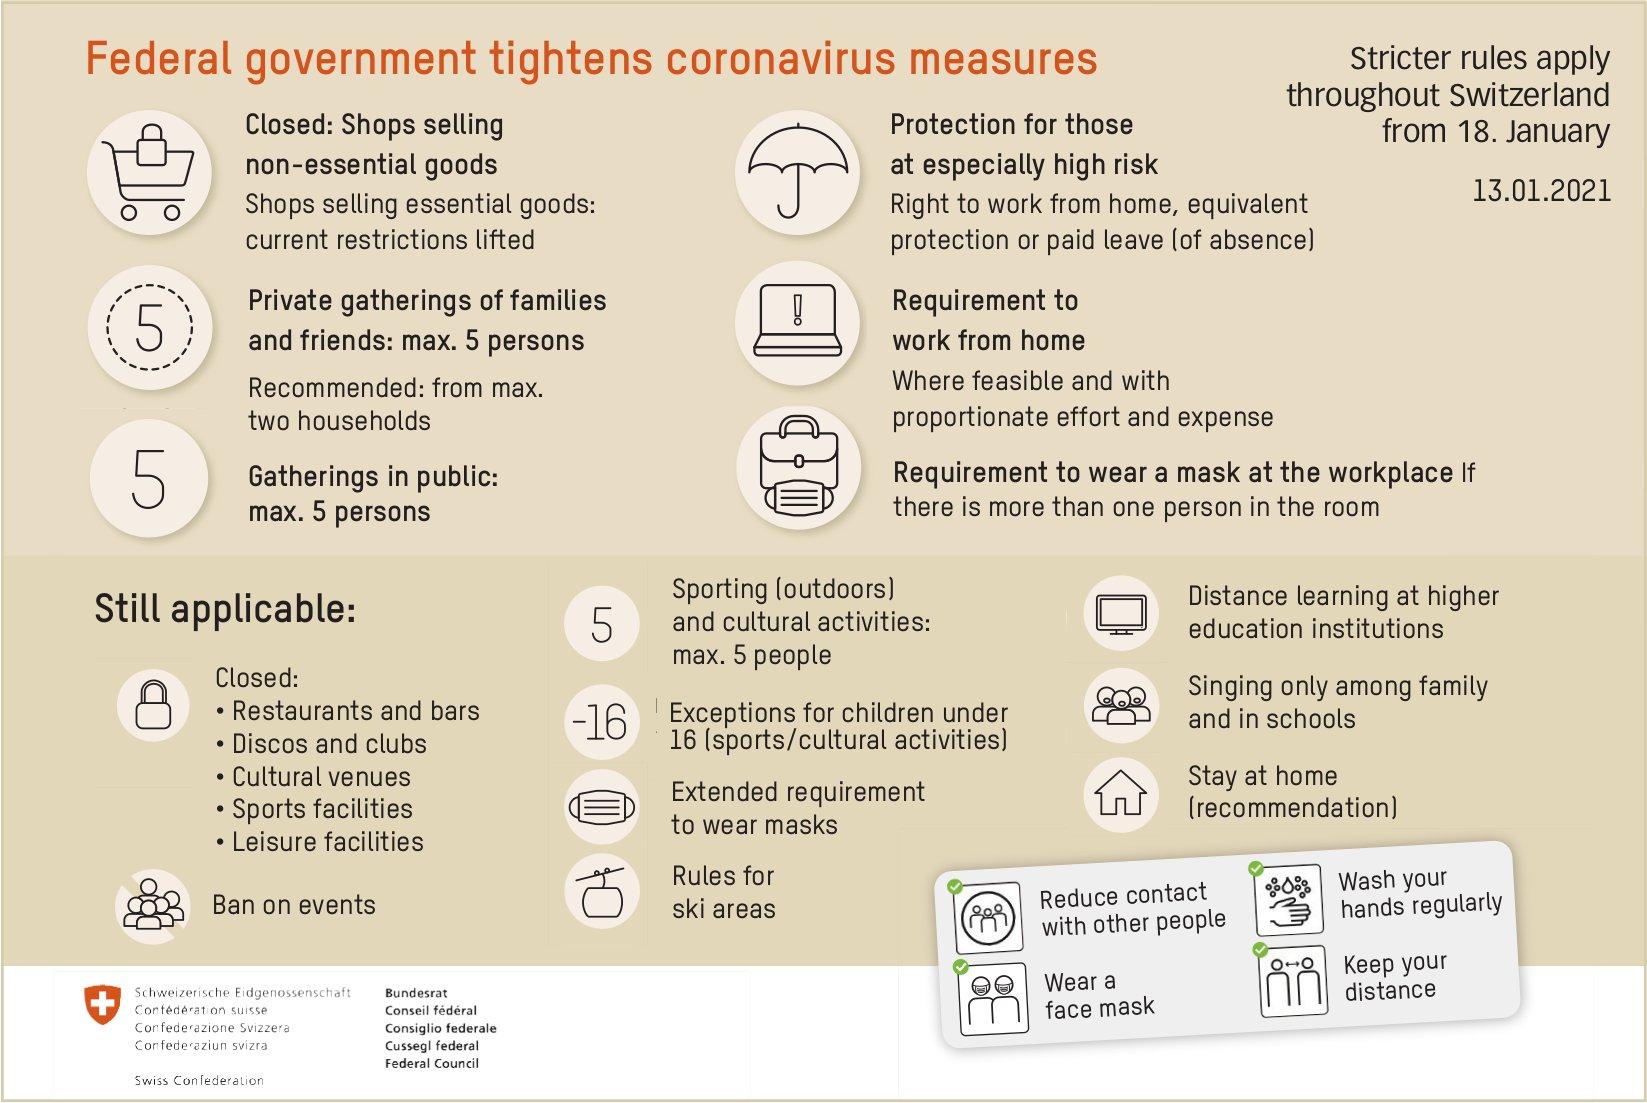 Federal Council - Federal government tightens coronavirus measures